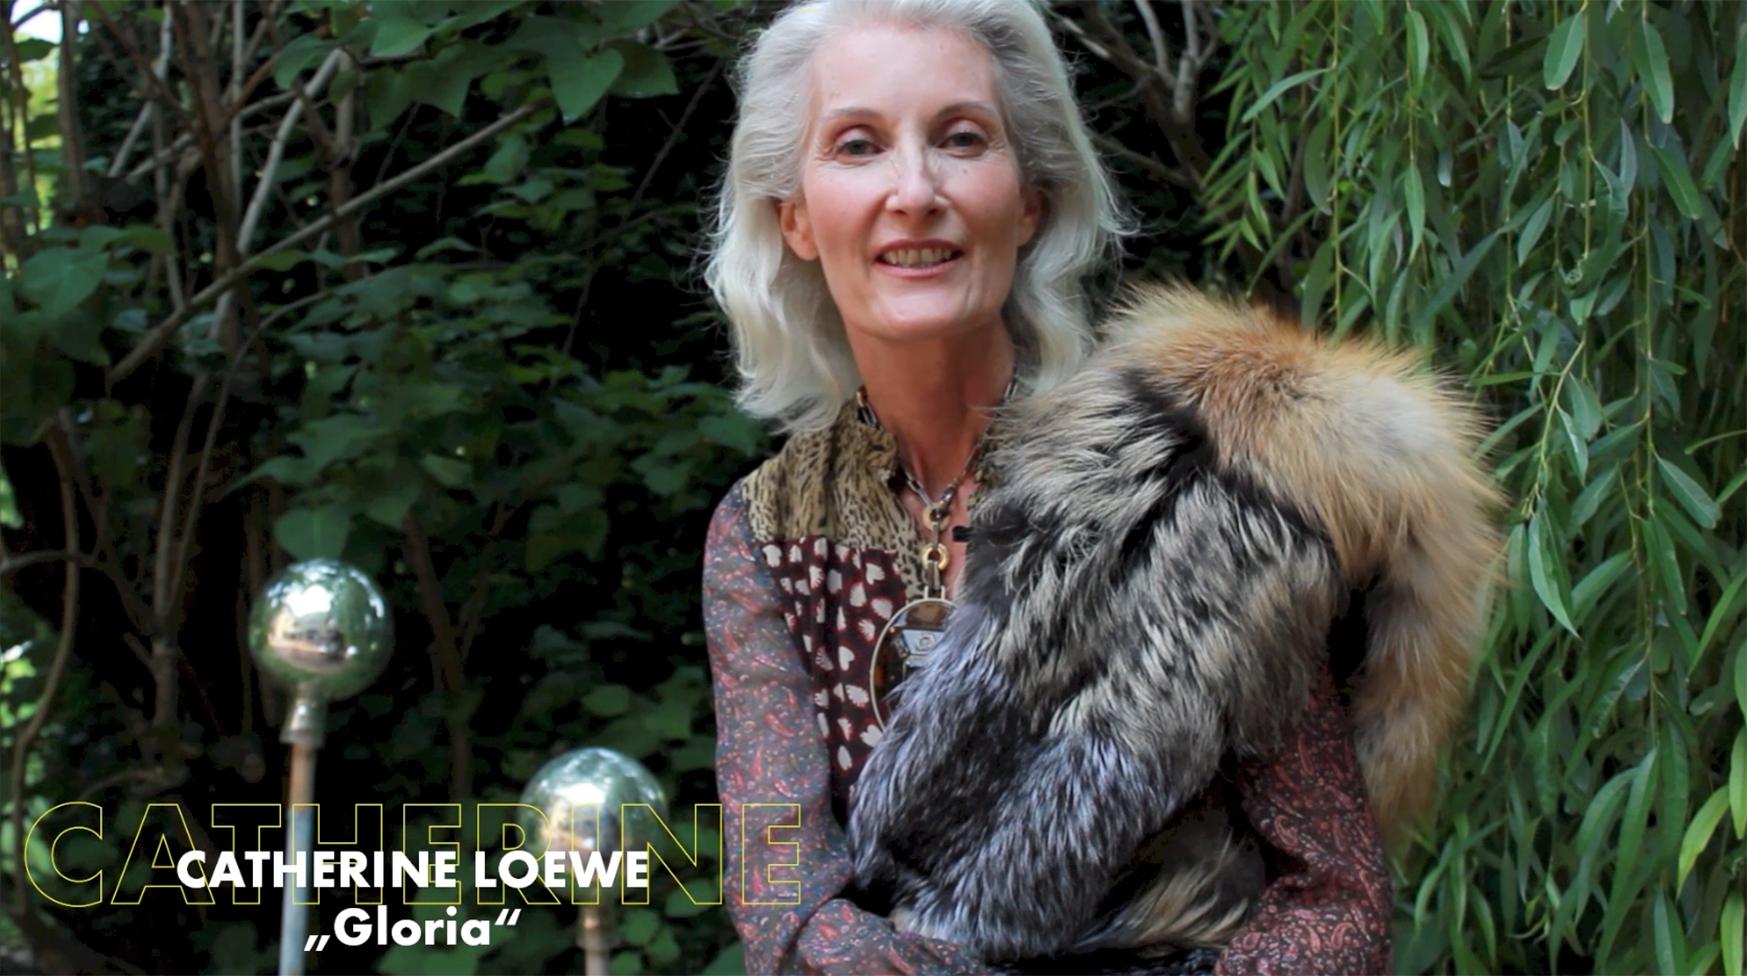 Fur Now 2015, A Family Portrait, Catherine Loewe